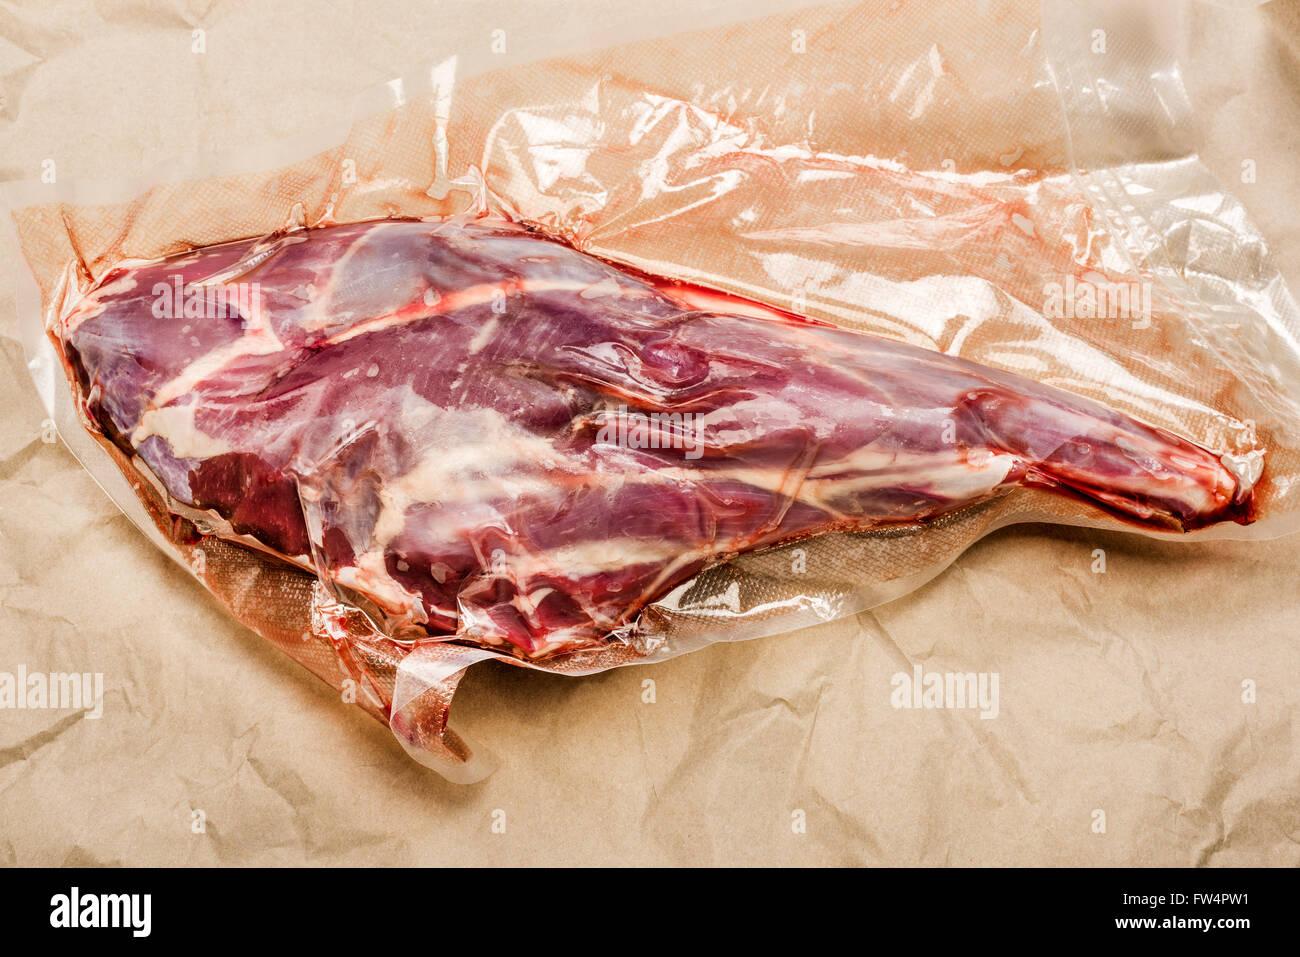 Long Bone Stockfotos & Long Bone Bilder - Alamy